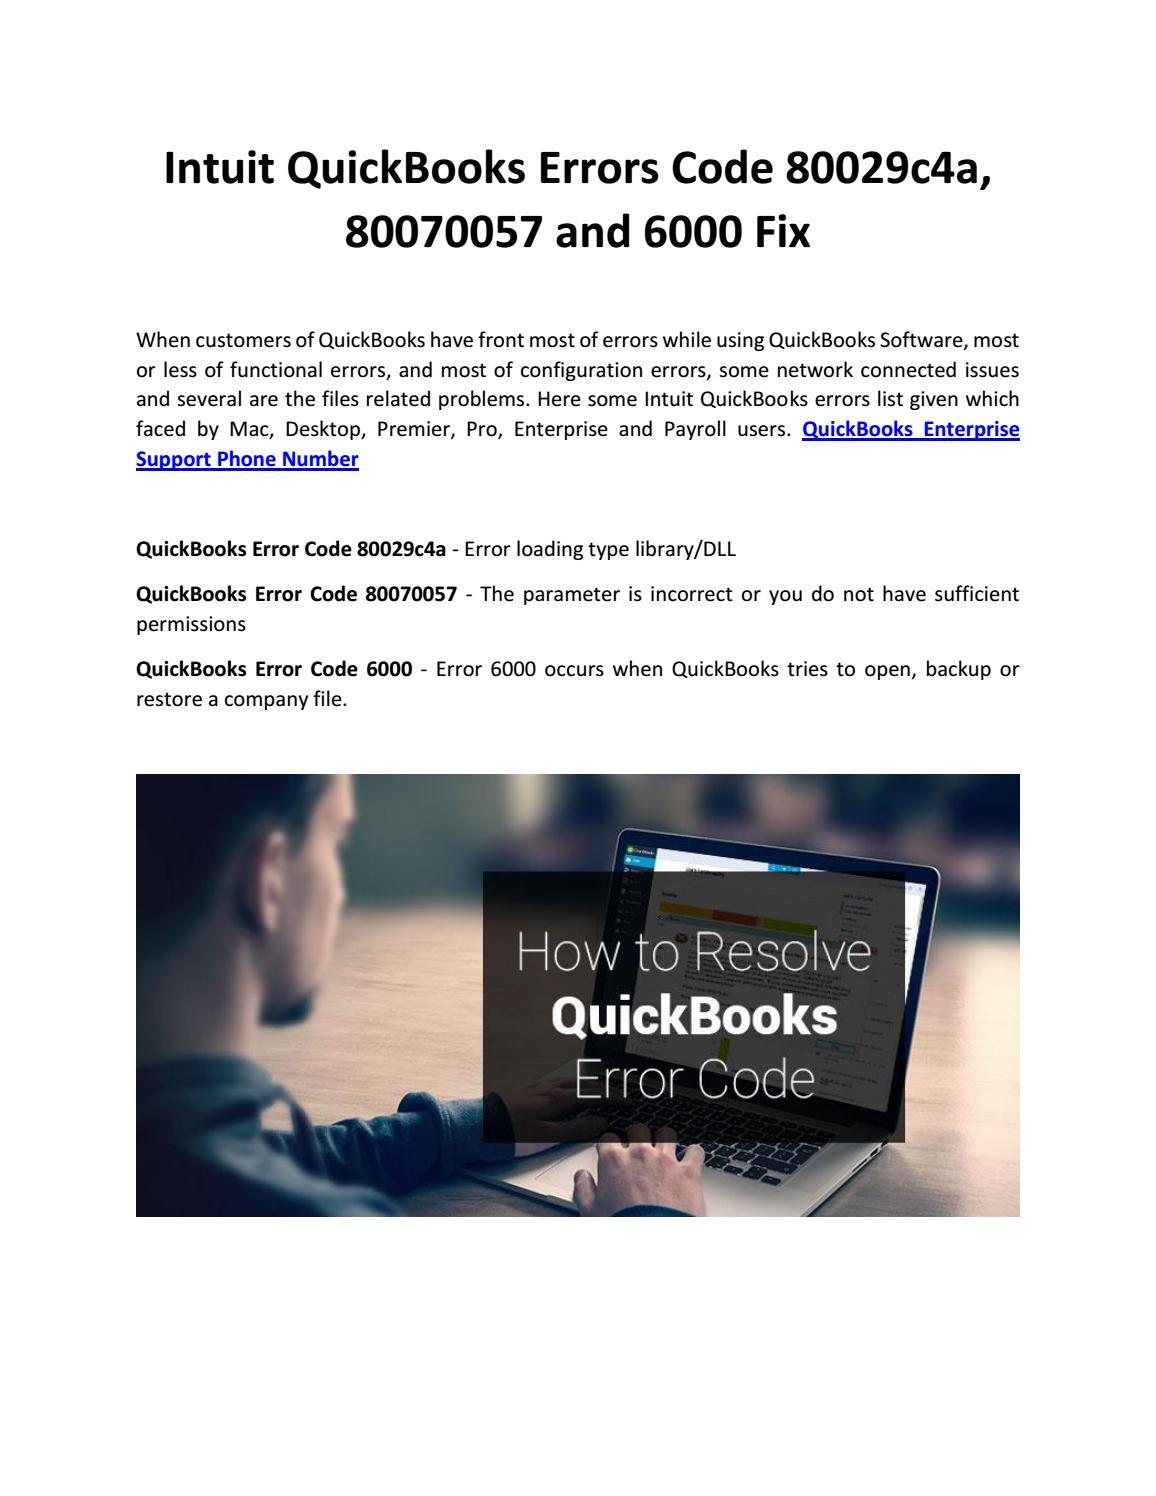 Intuit quickbooks errors code 80029c4a, 80070057 and 6000